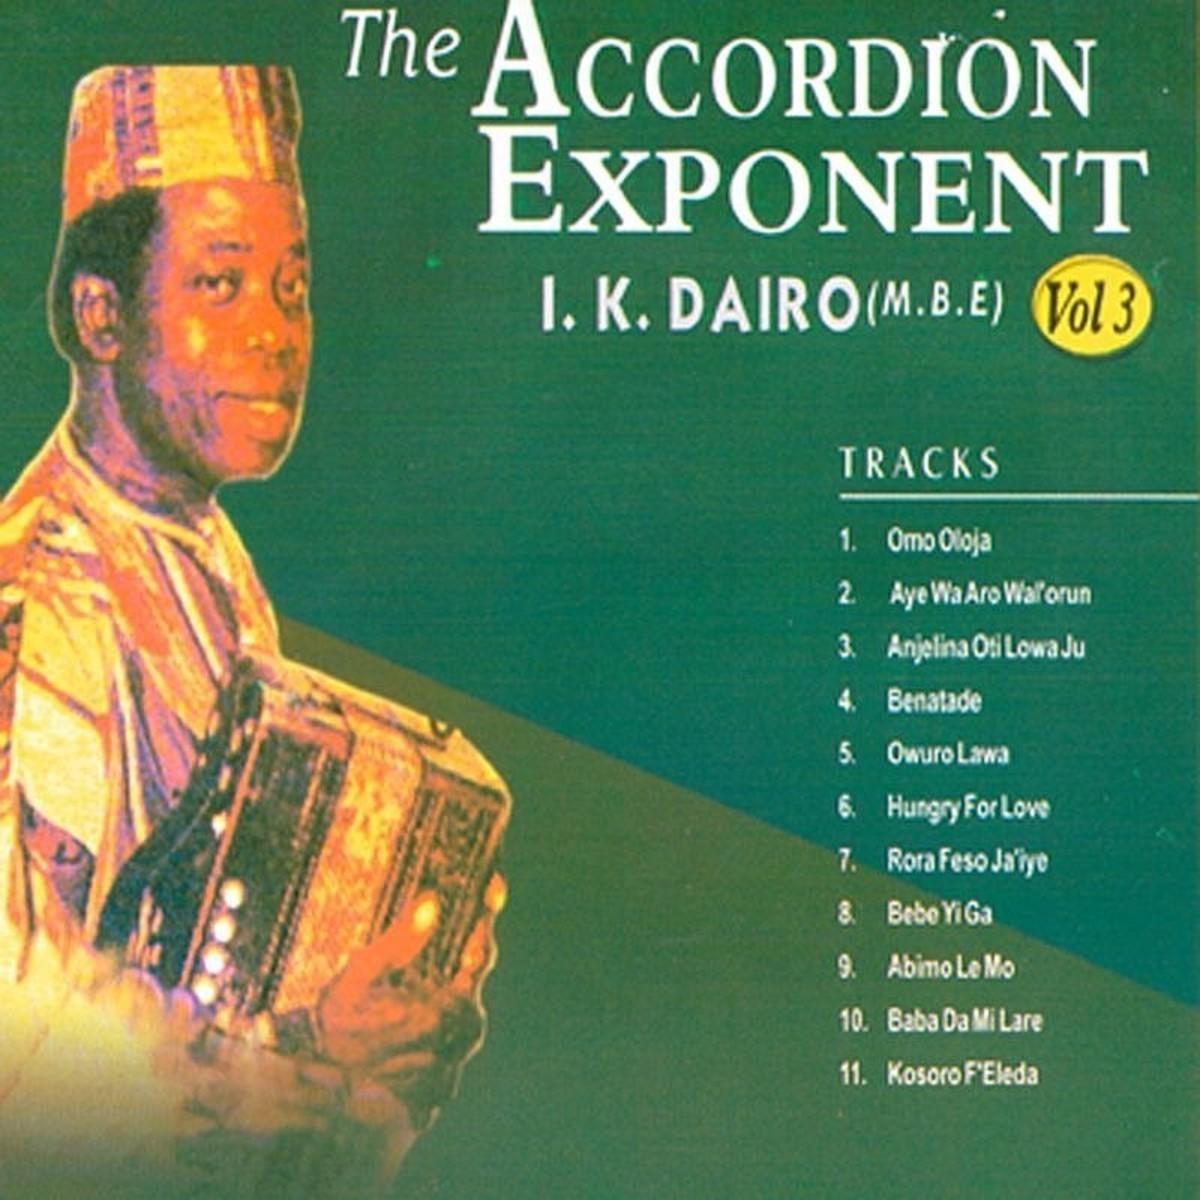 I.K. Dairo - Rora Feso Jaiye mp3 download